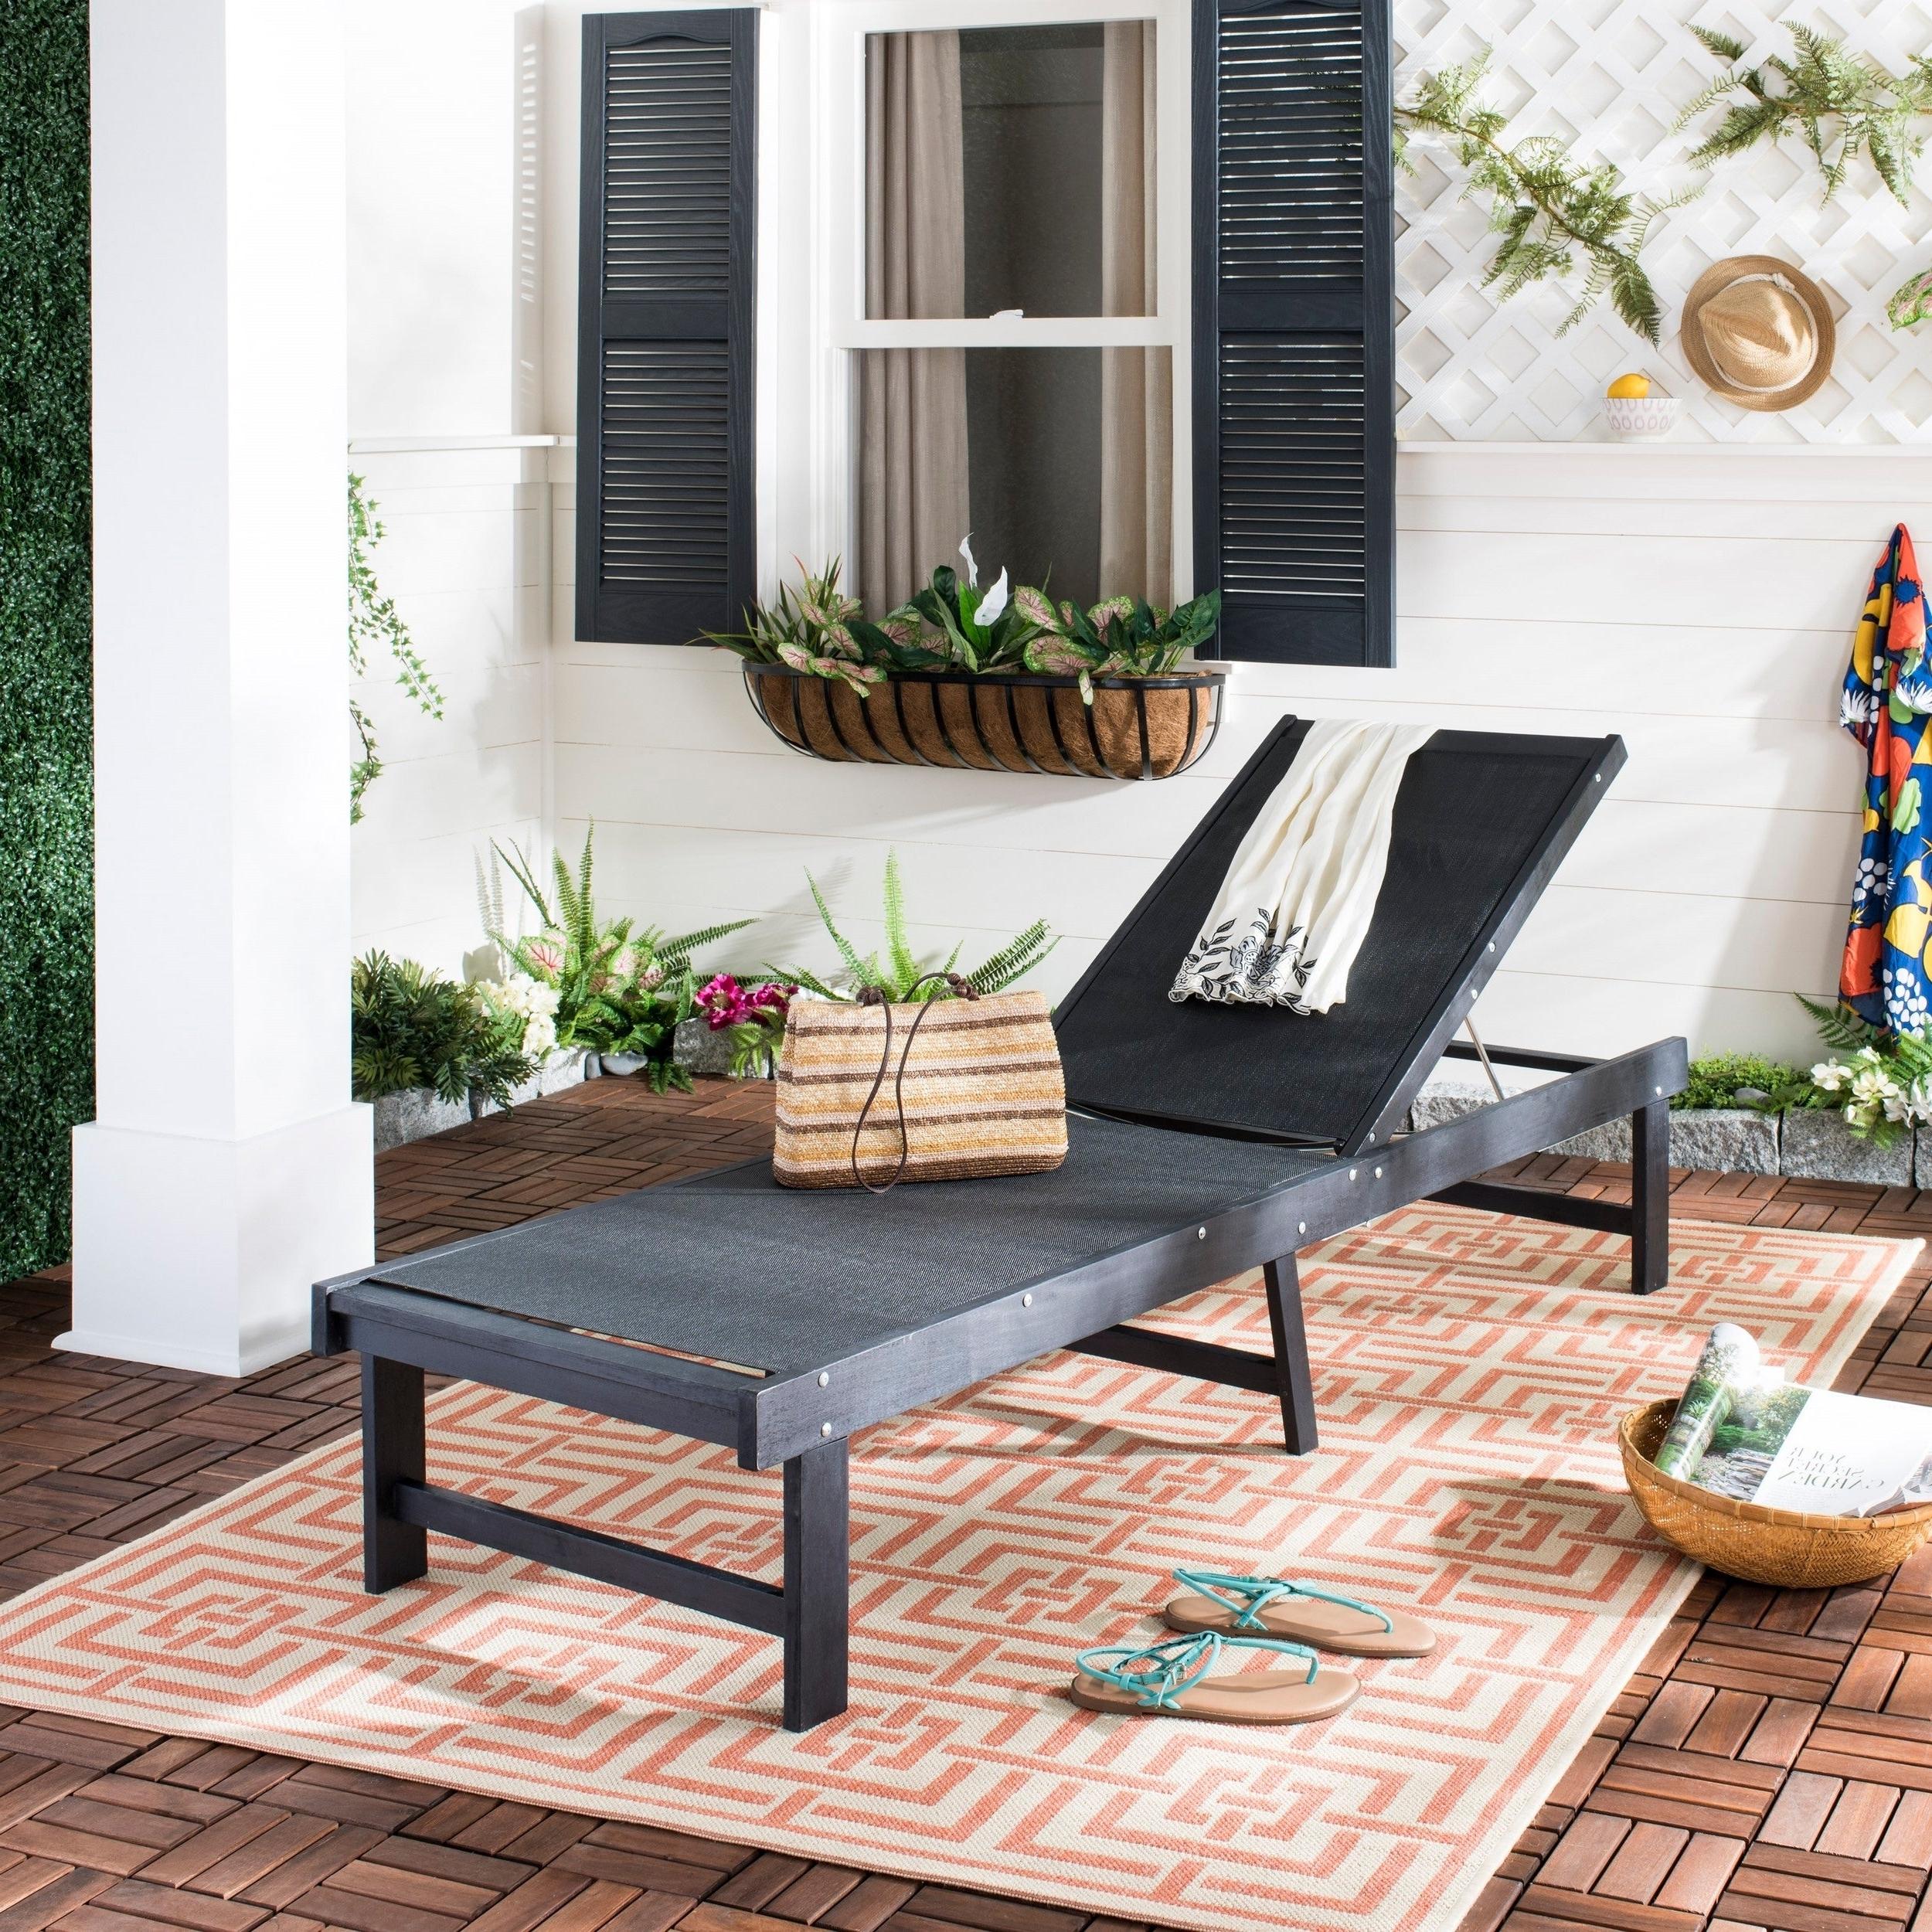 "Outdoor Living Manteca Dark Slate Lounge Chairs Intended For 2020 Safavieh Outdoor Living Manteca Dark Slate Grey/ Black Lounge Chair – 23.6""  X  (View 14 of 25)"